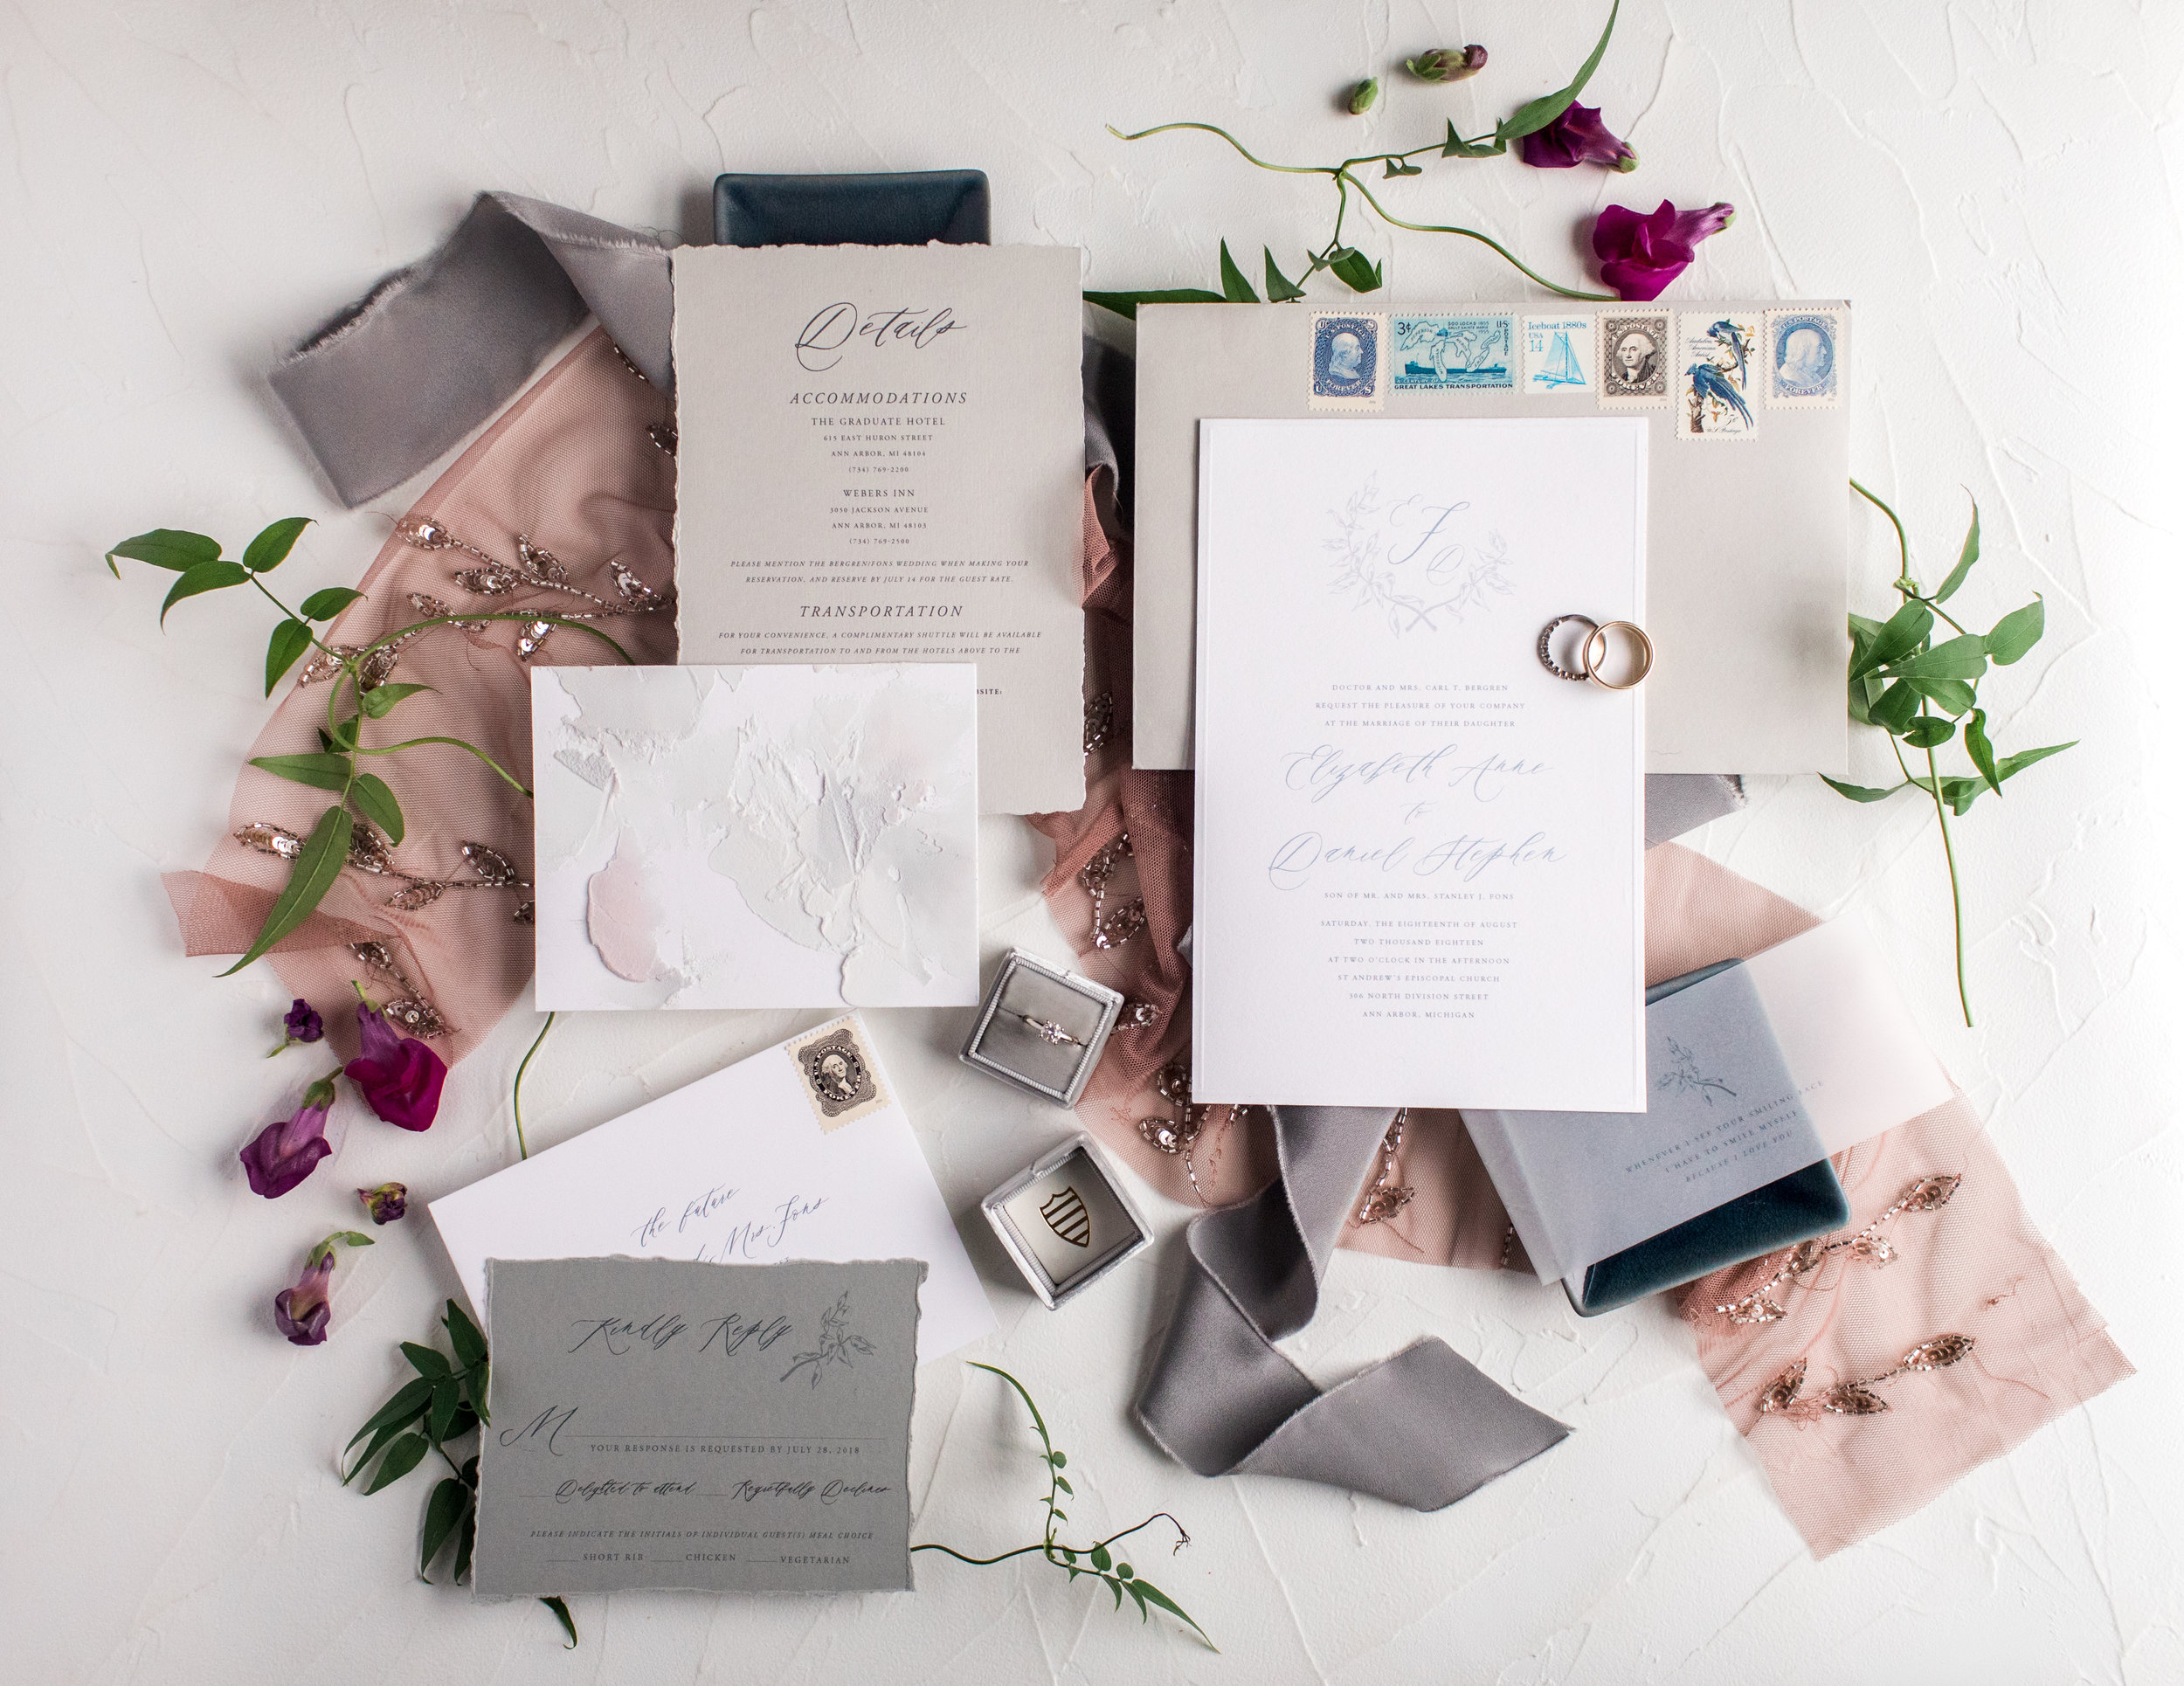 Casey-brodley-branding-invitations-suite.jpg